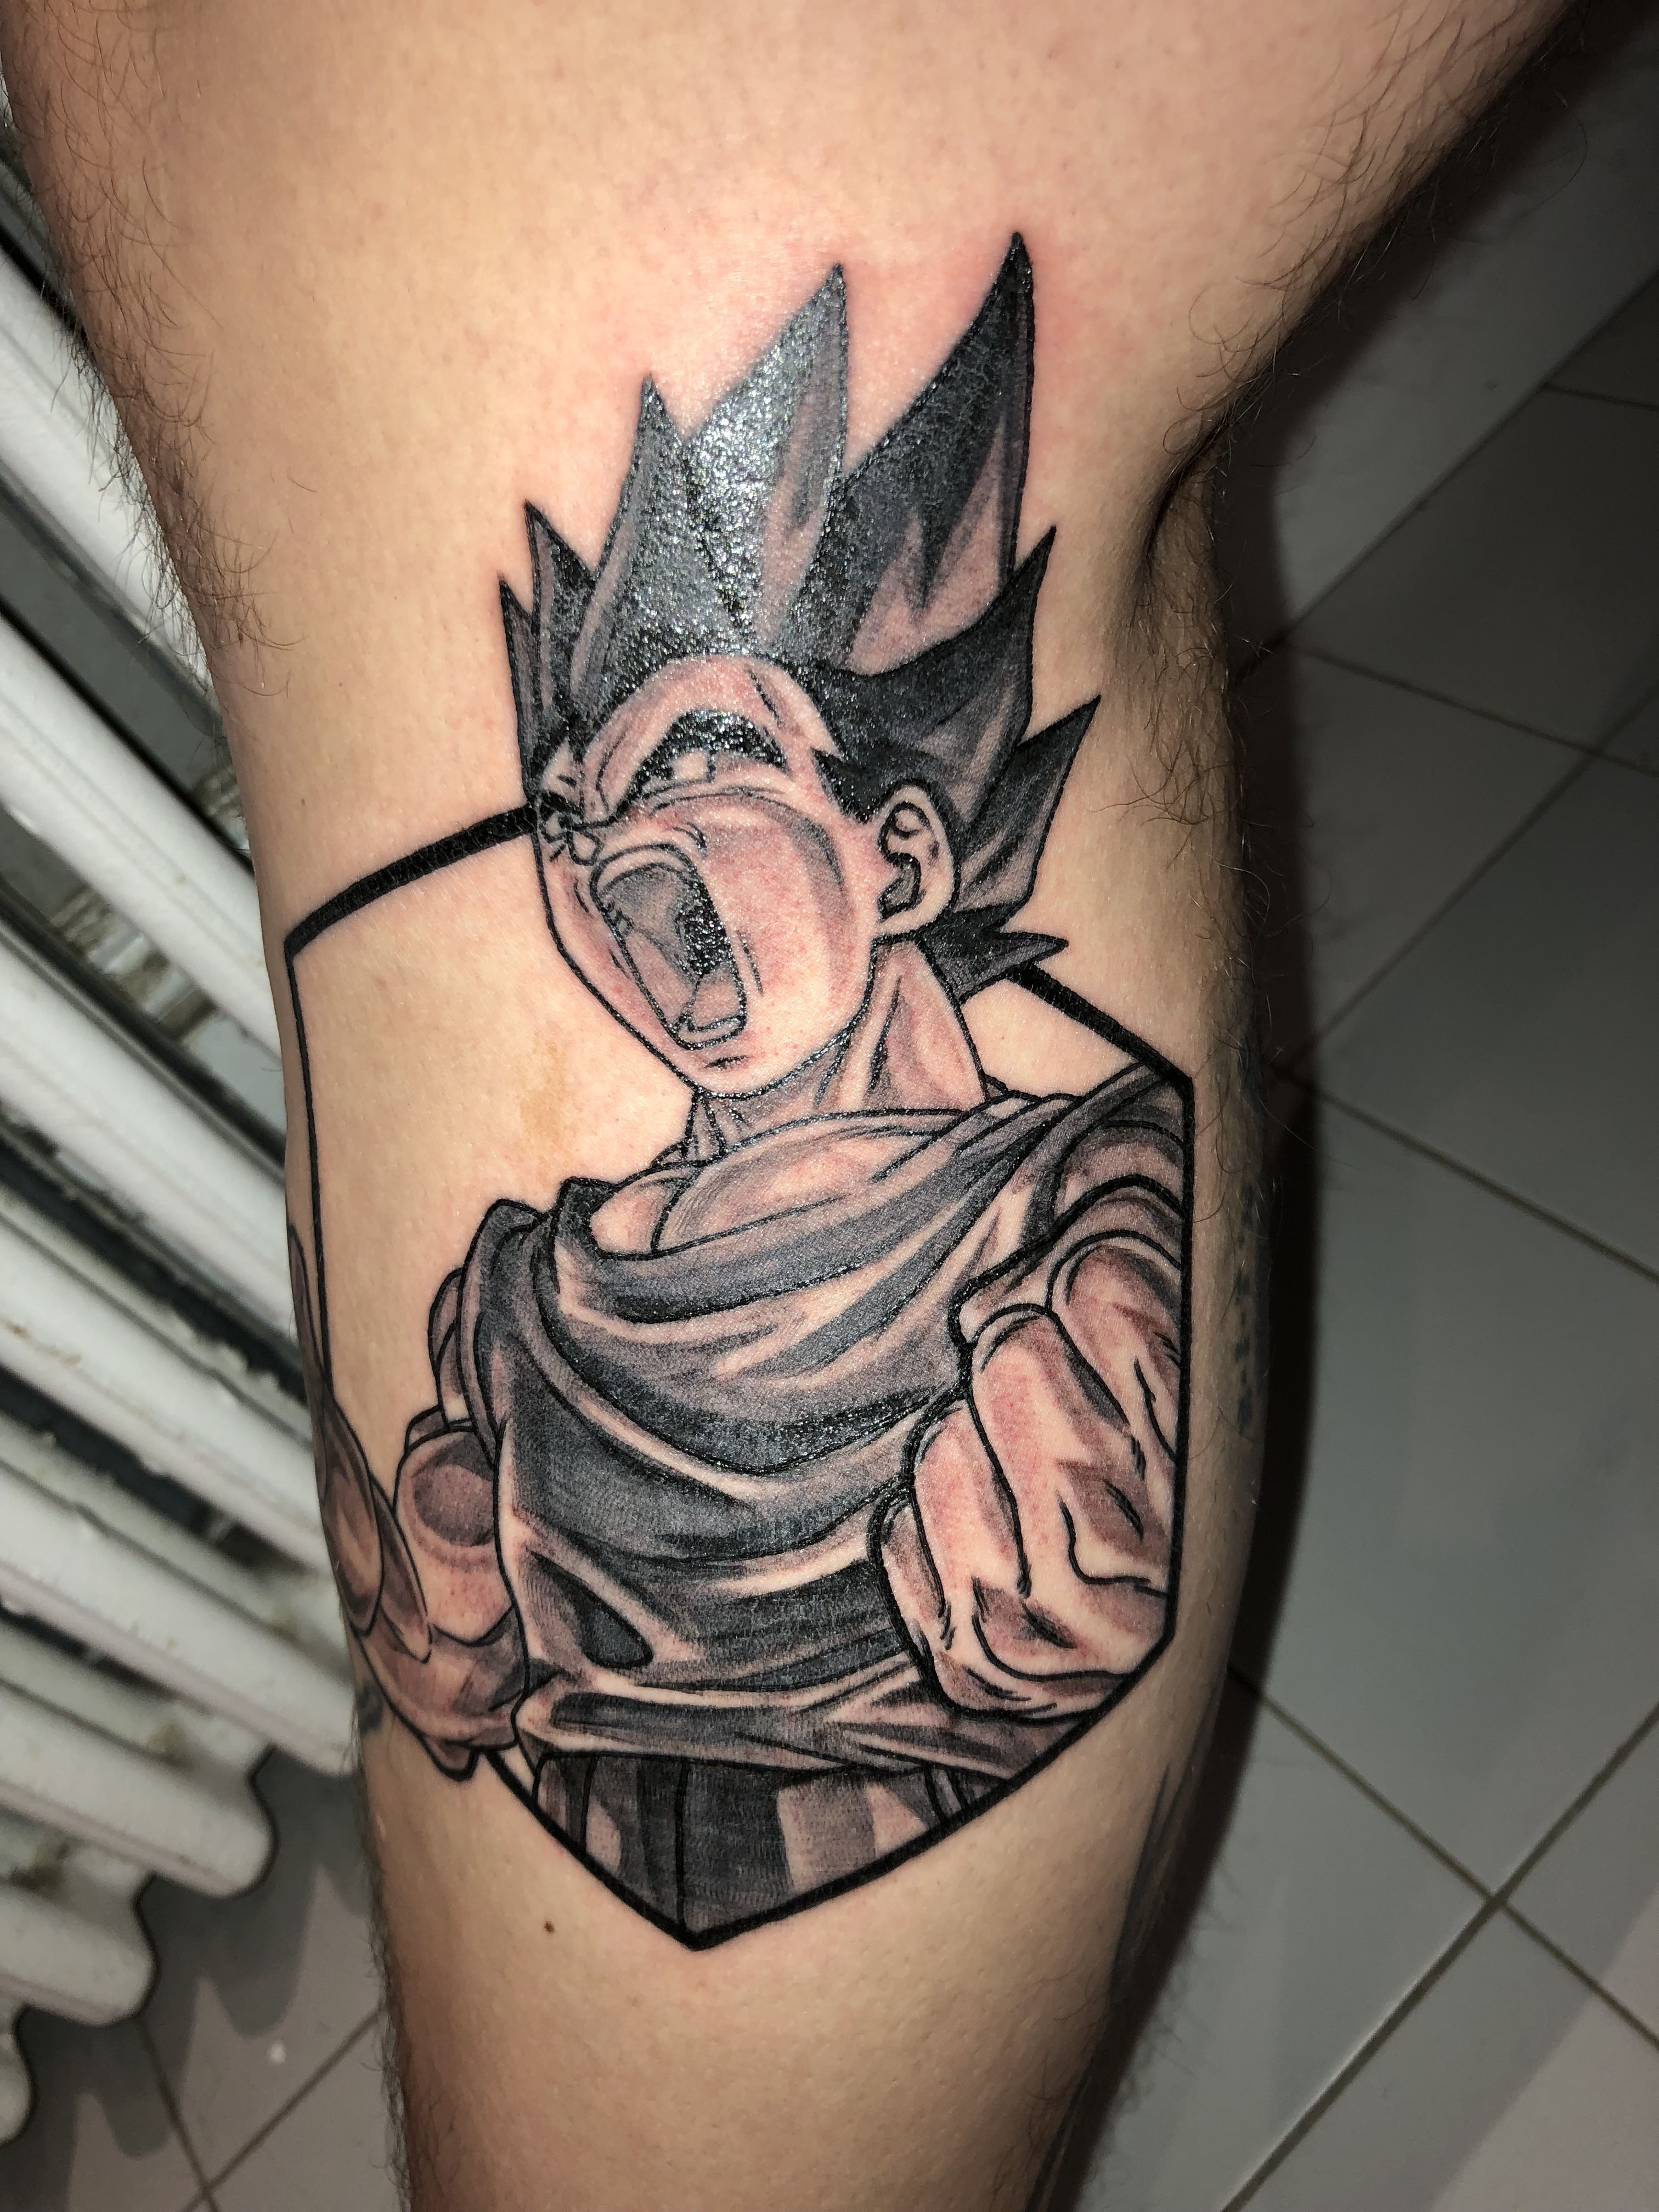 Vegeta Tattoo Leg Sleeve Dragonball Z